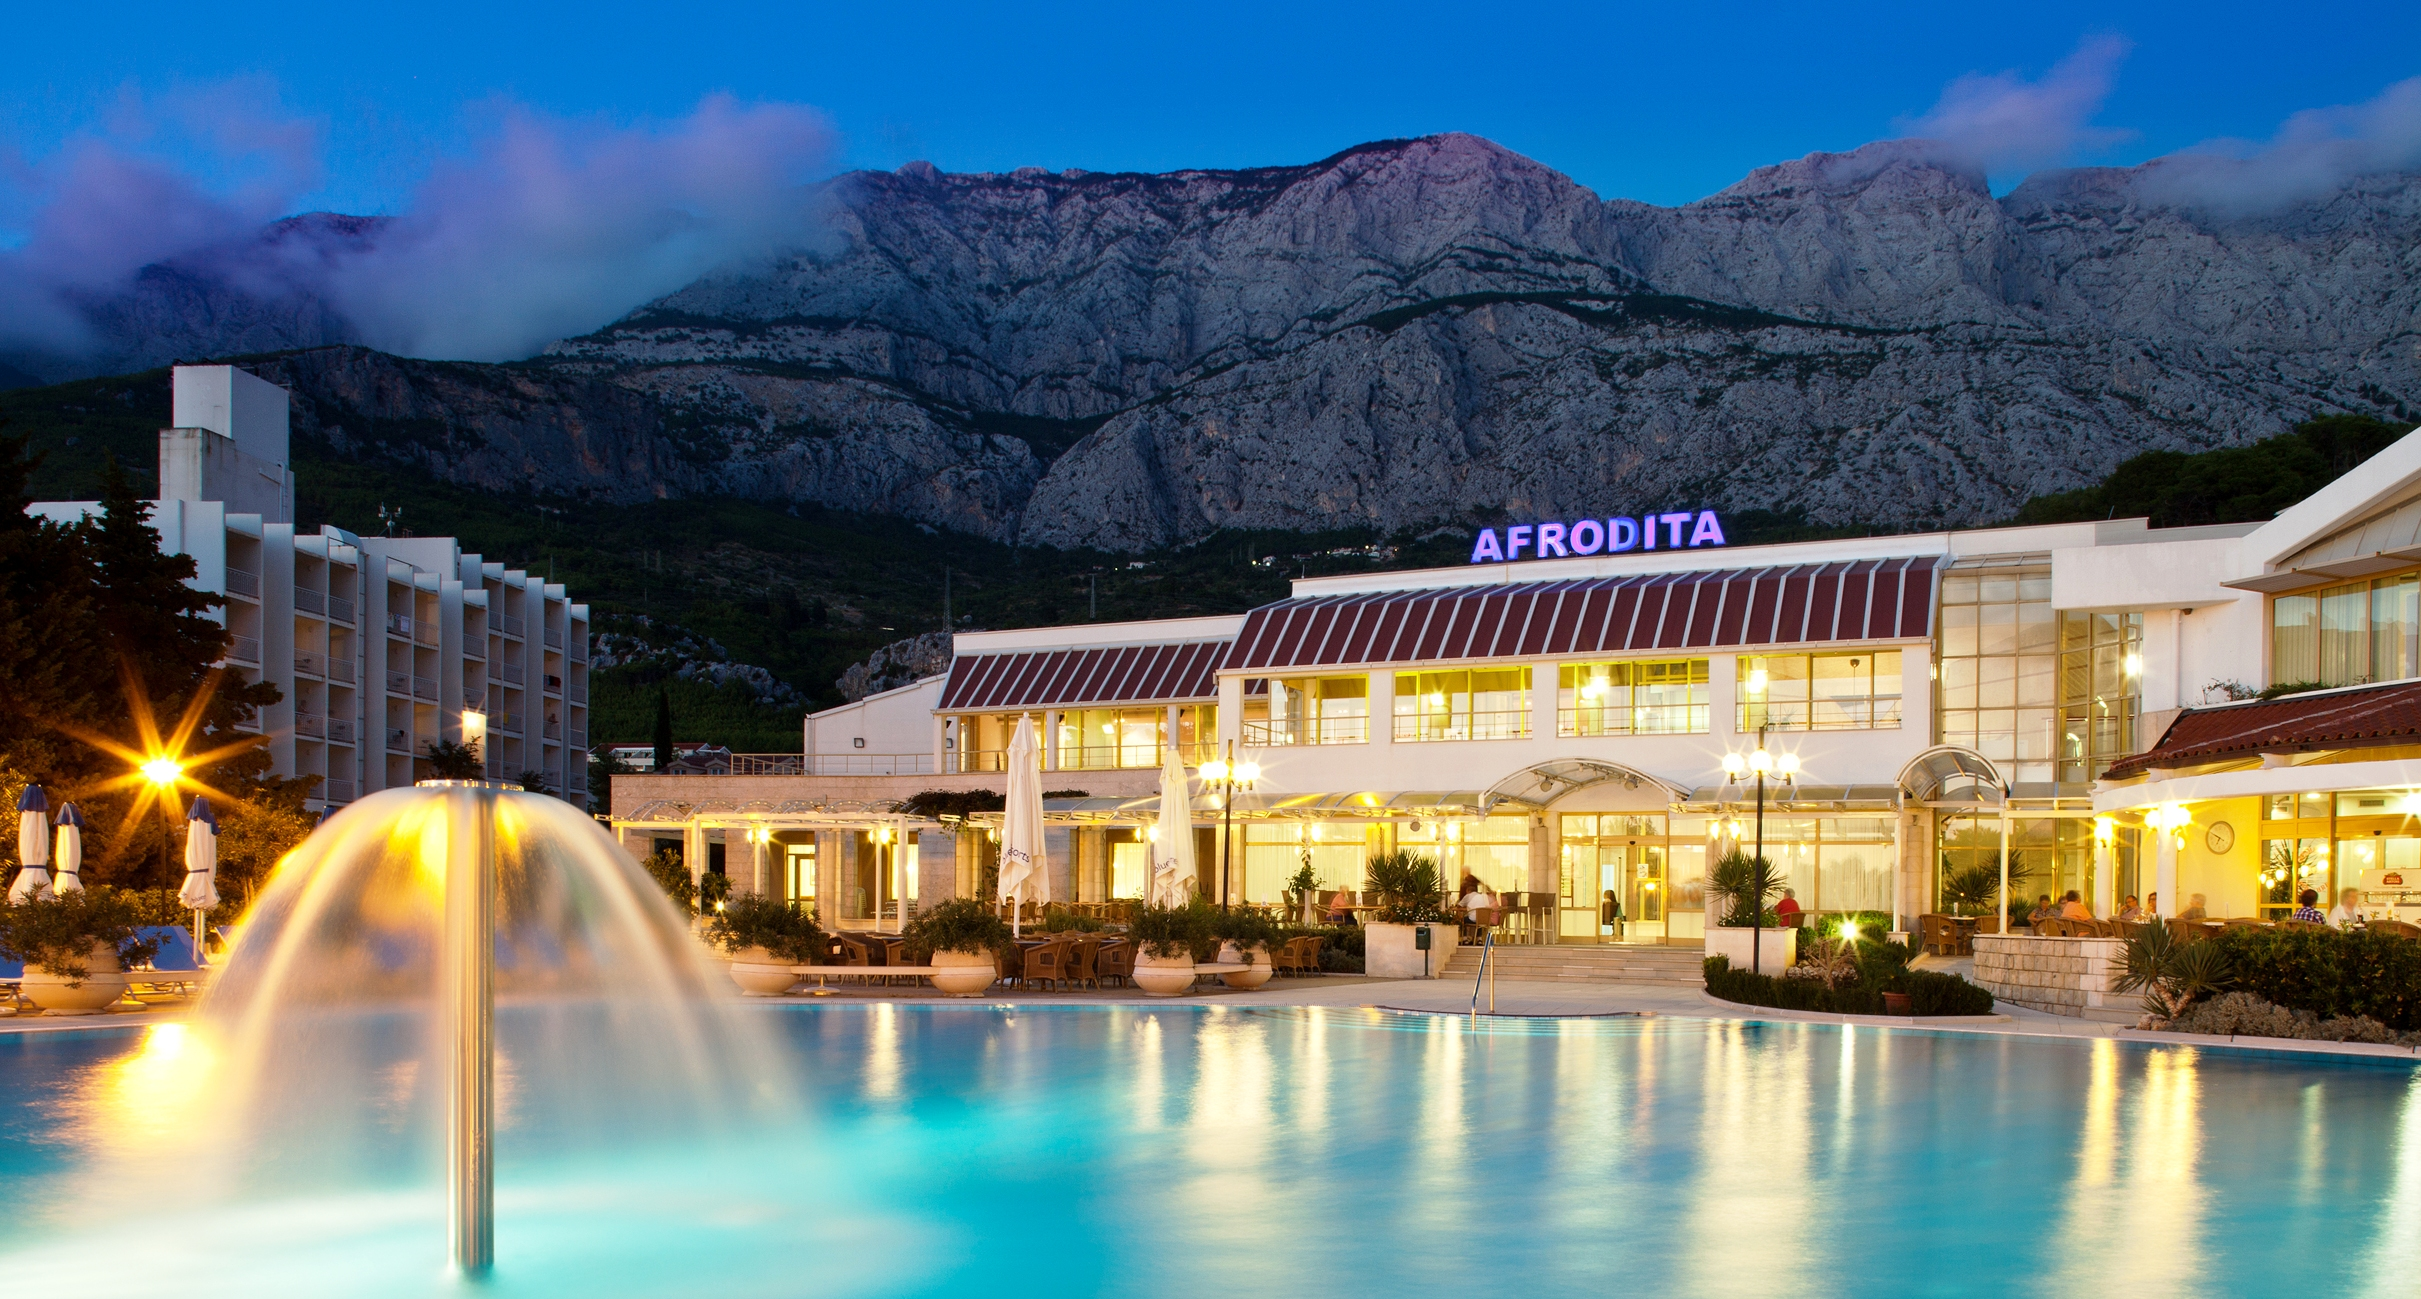 Bluesun Resort Afrodita ****